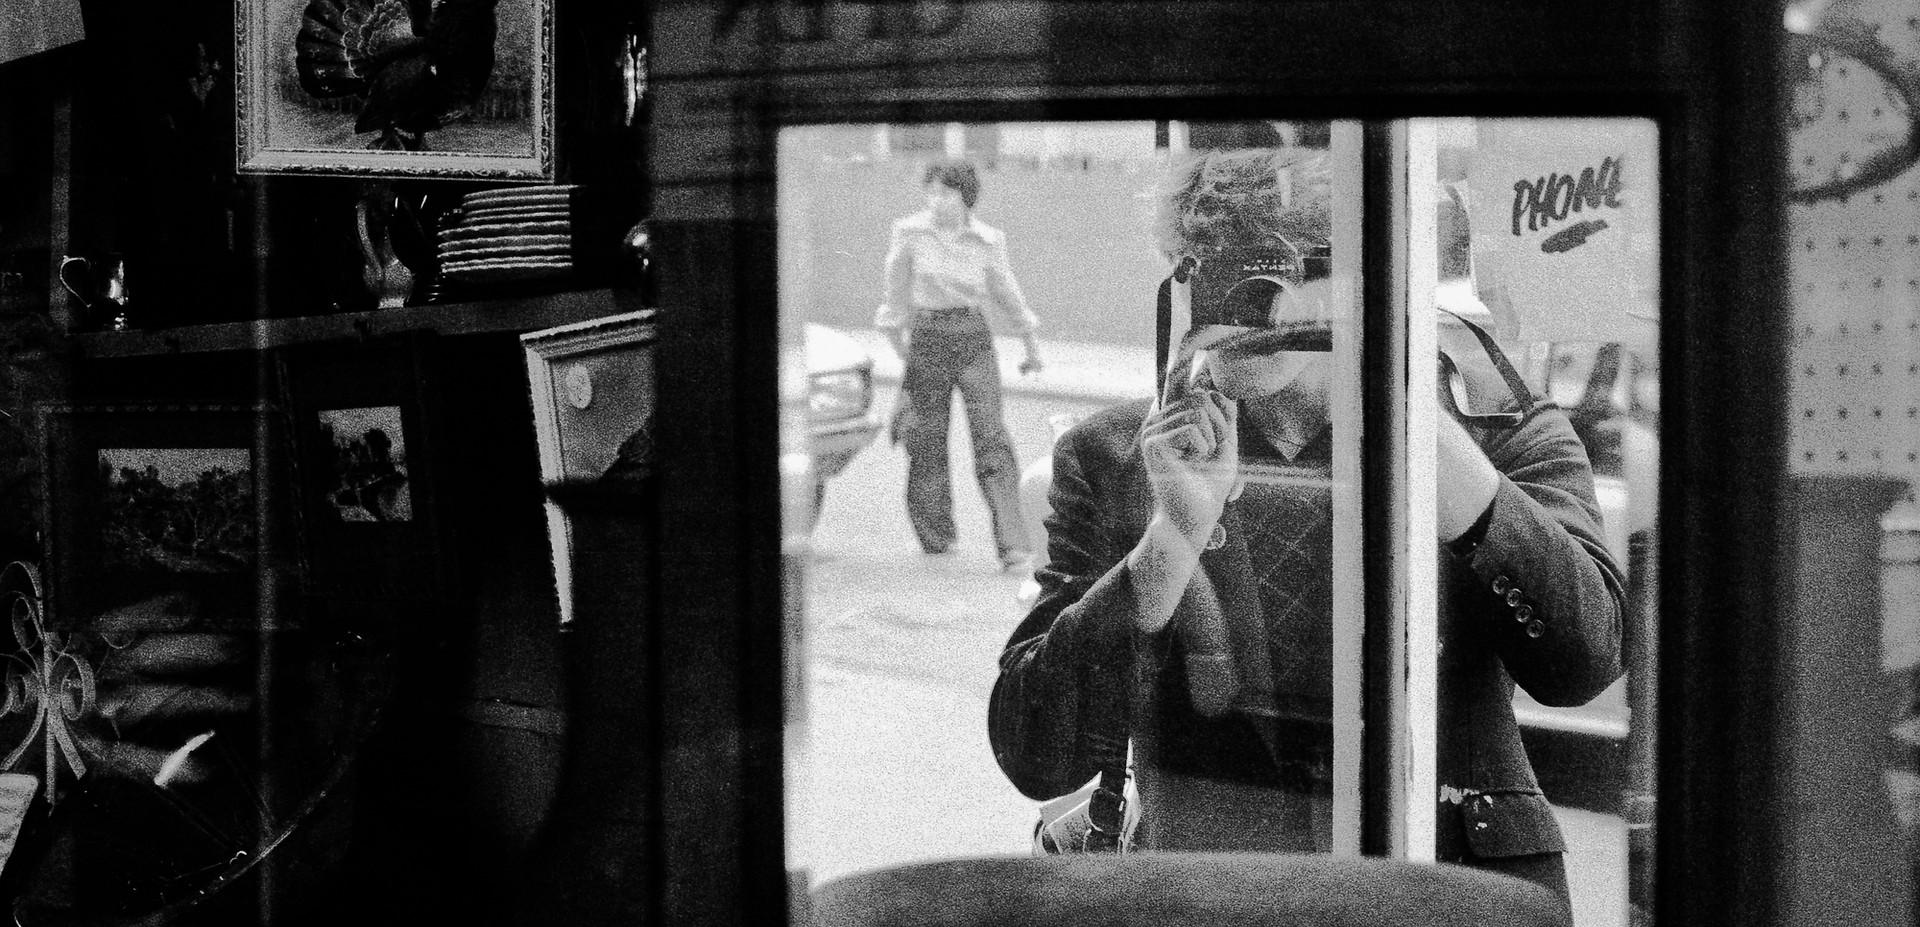 Selfie_London, England 1979